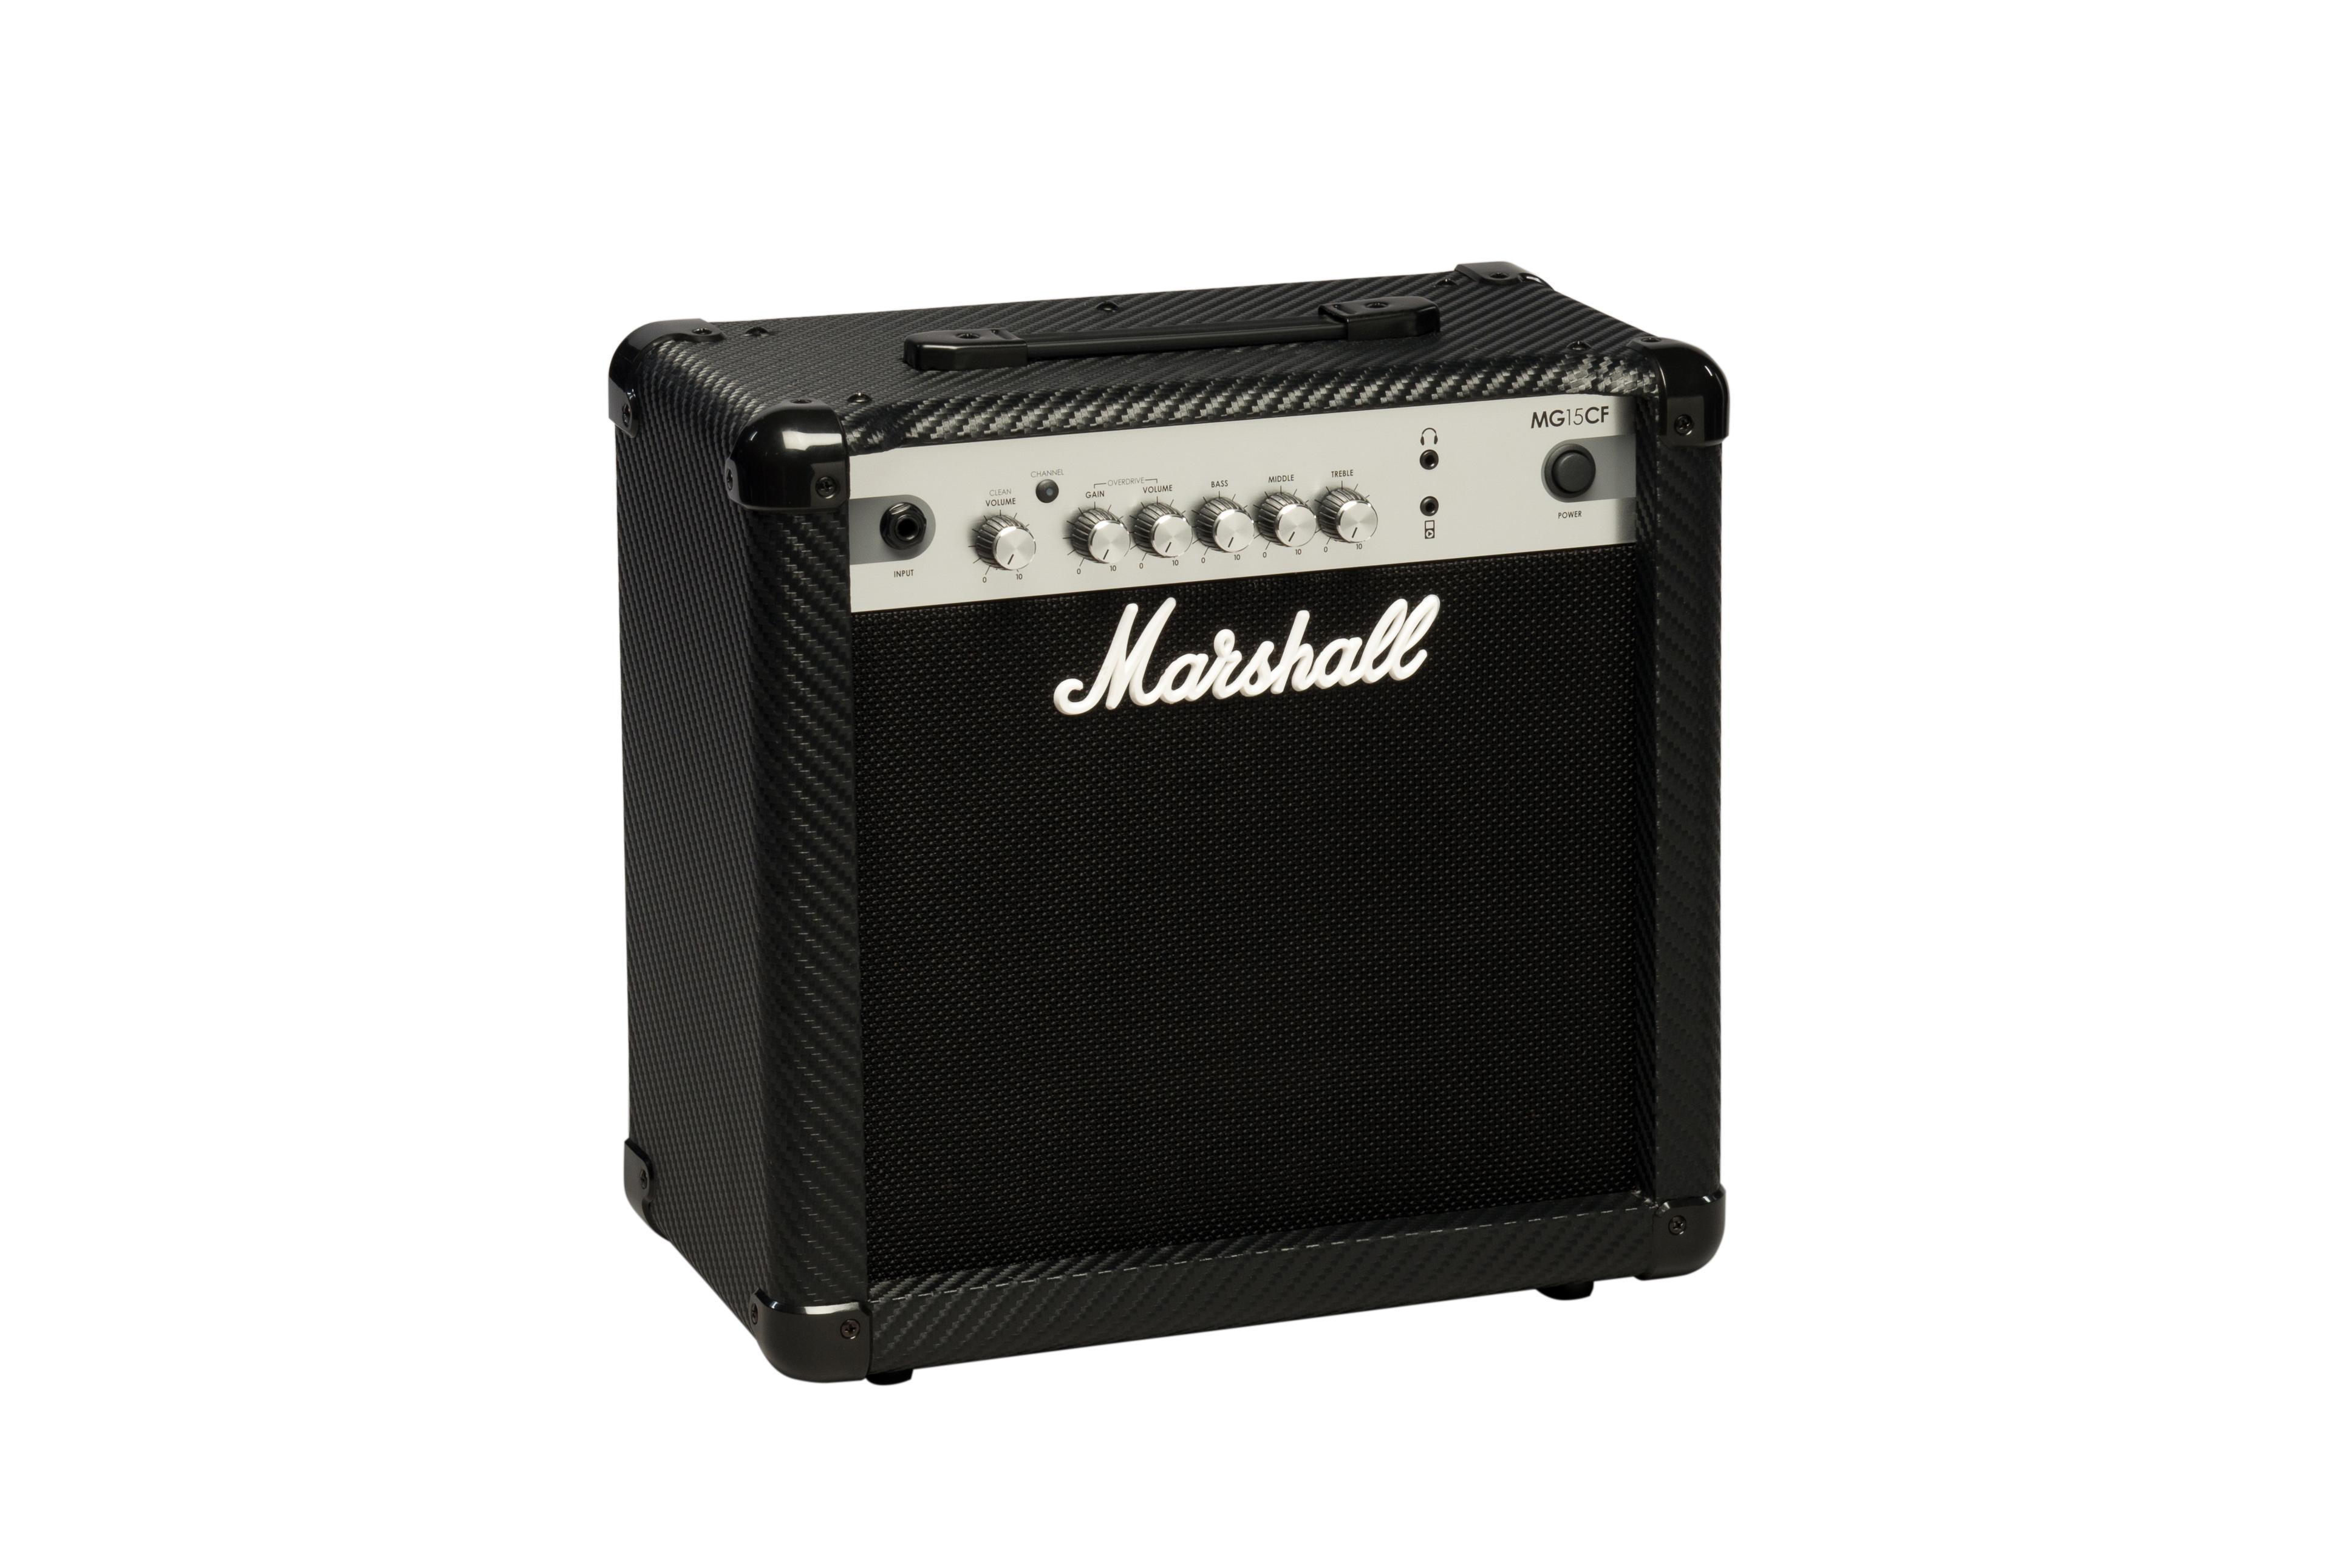 marshall mg15cf mg series 15 watt guitar combo amp musical instruments. Black Bedroom Furniture Sets. Home Design Ideas